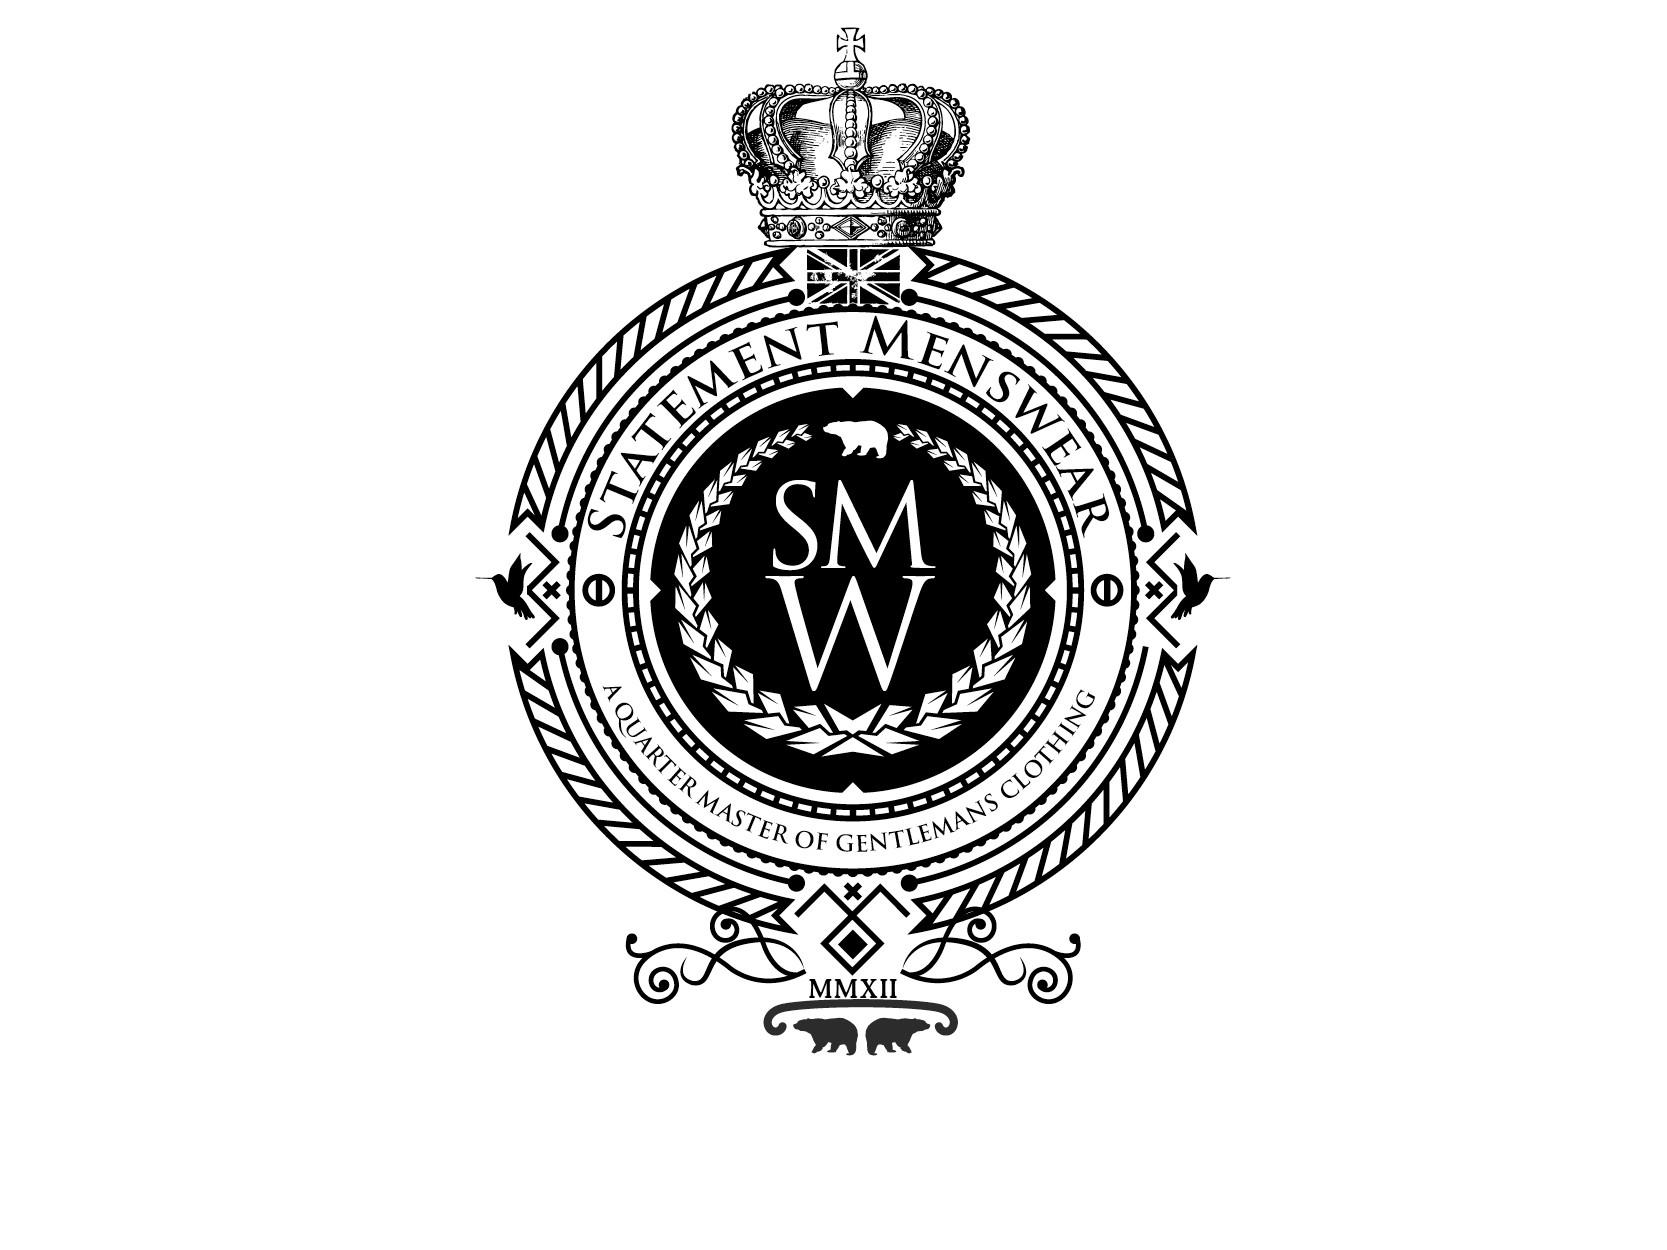 Statement Menswear logo